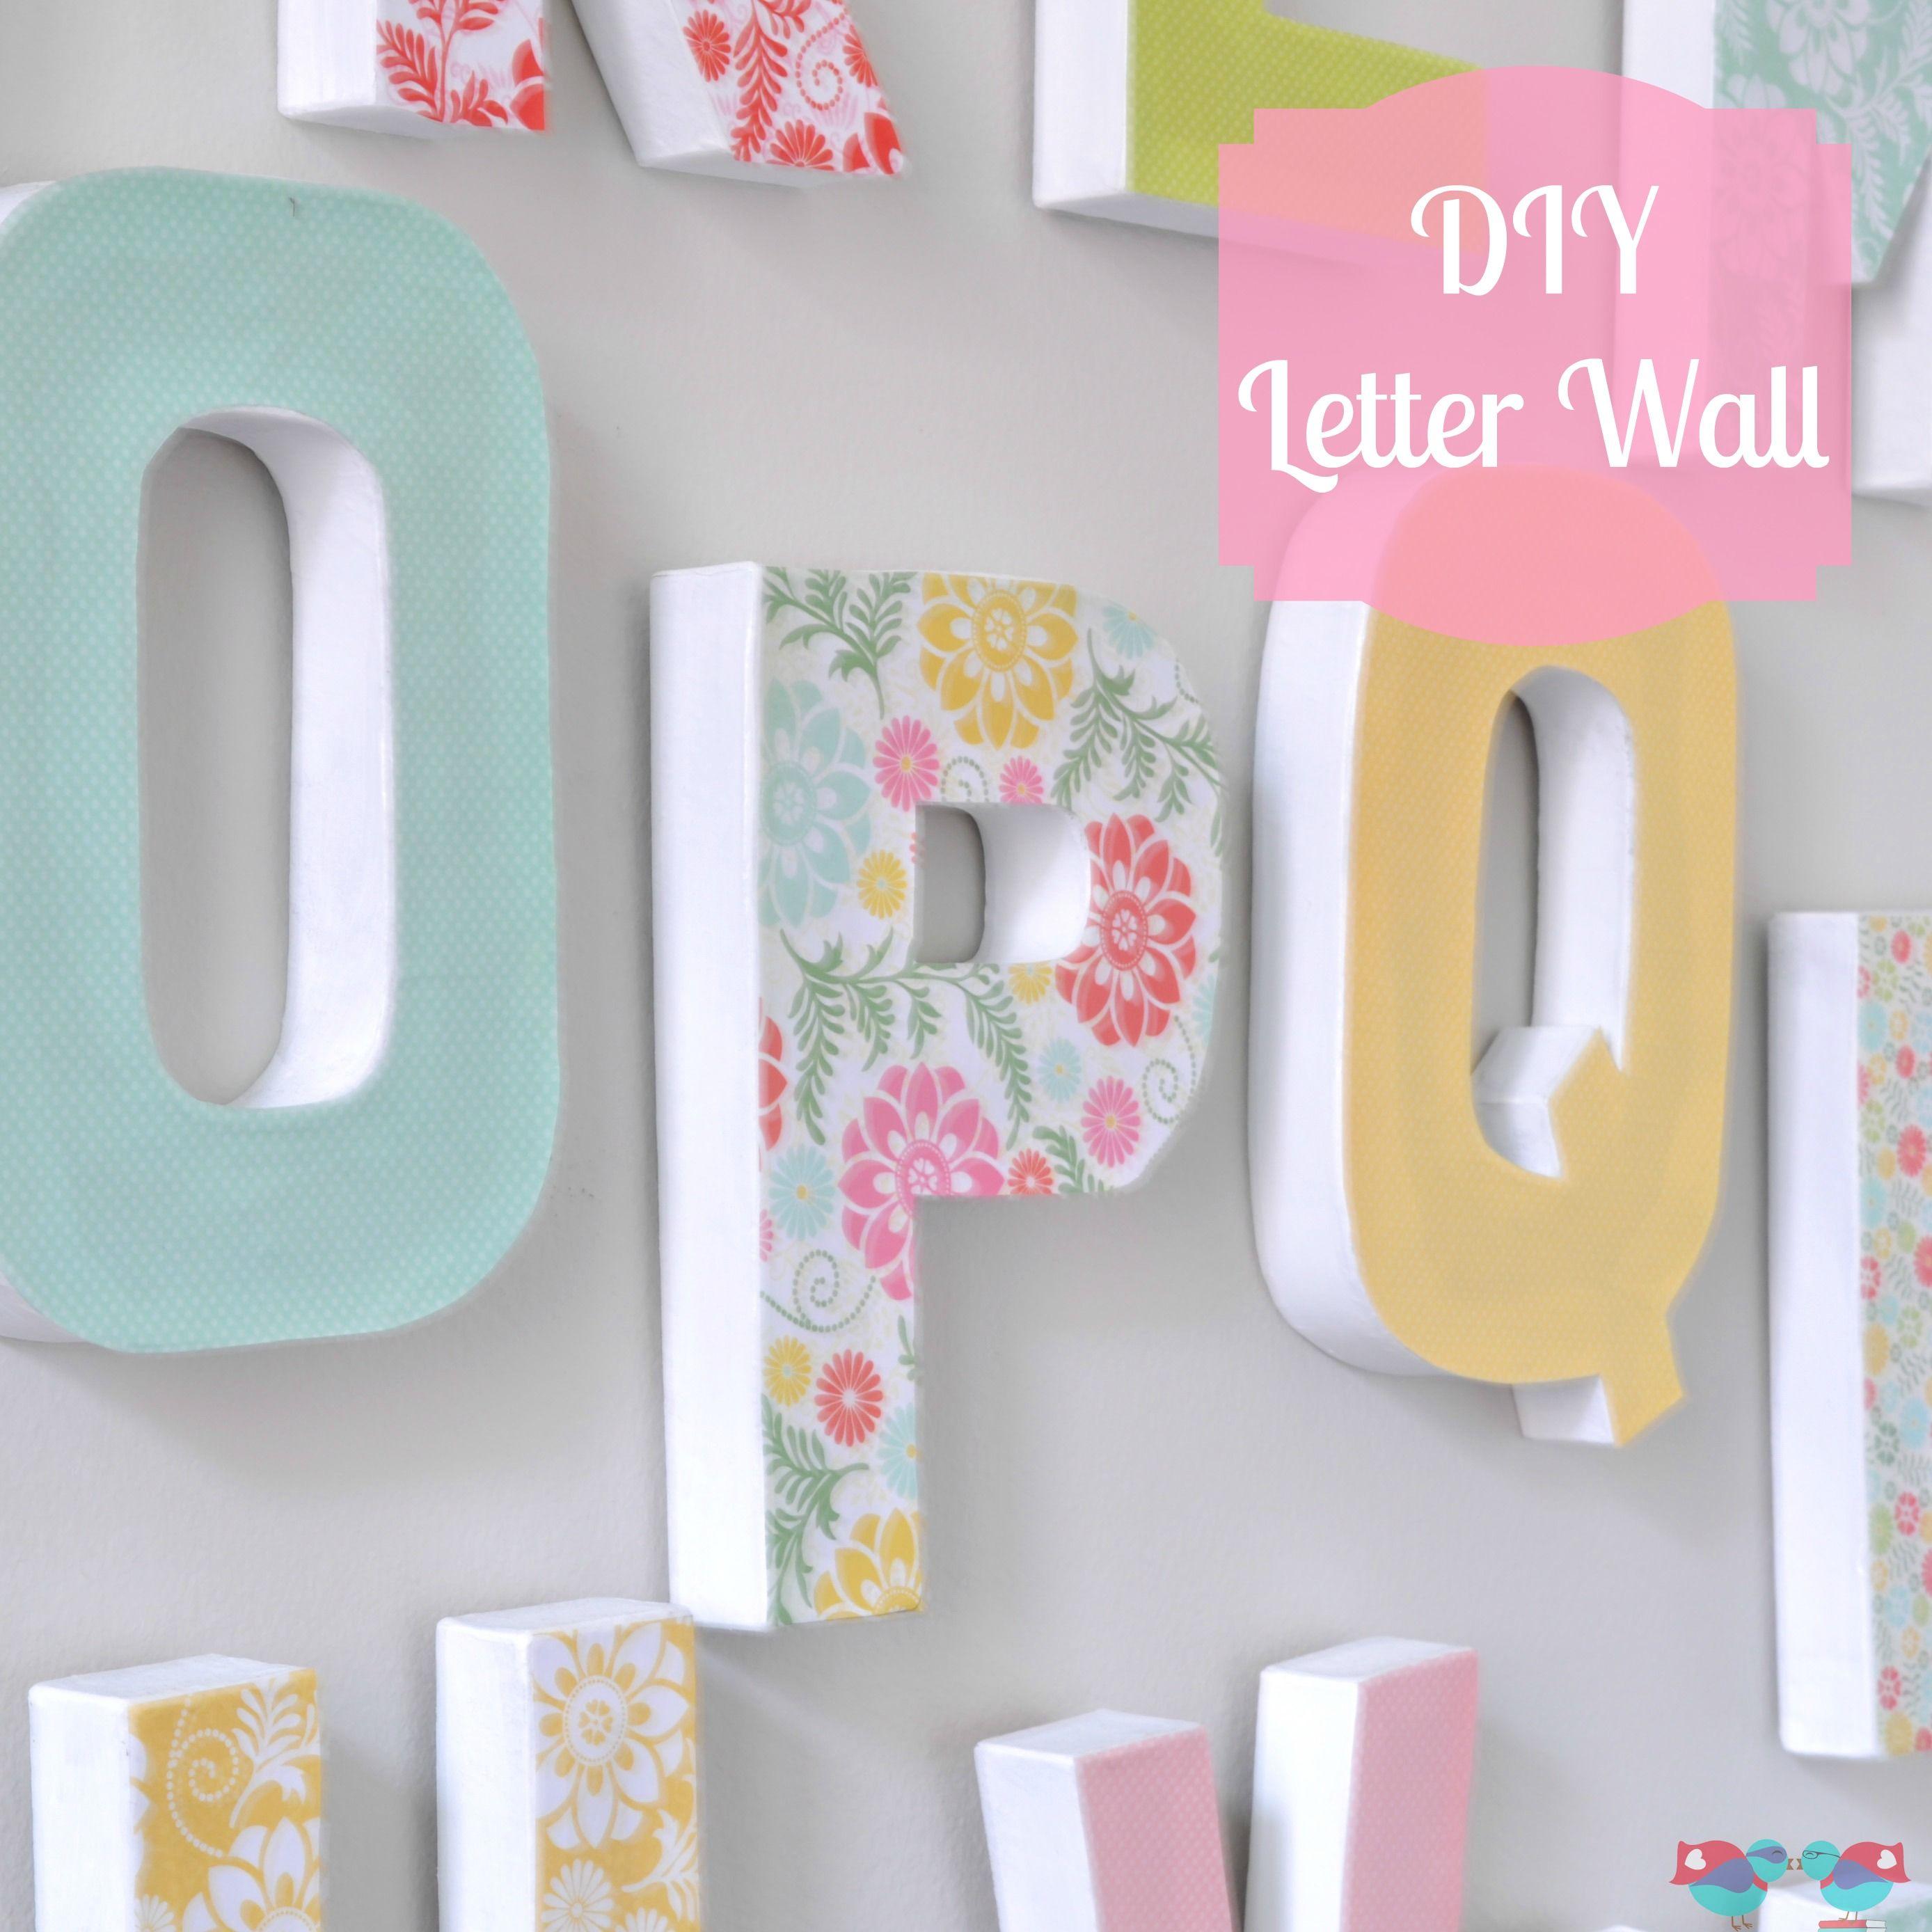 of decor rustic house c hanger door metal letter wall farm new